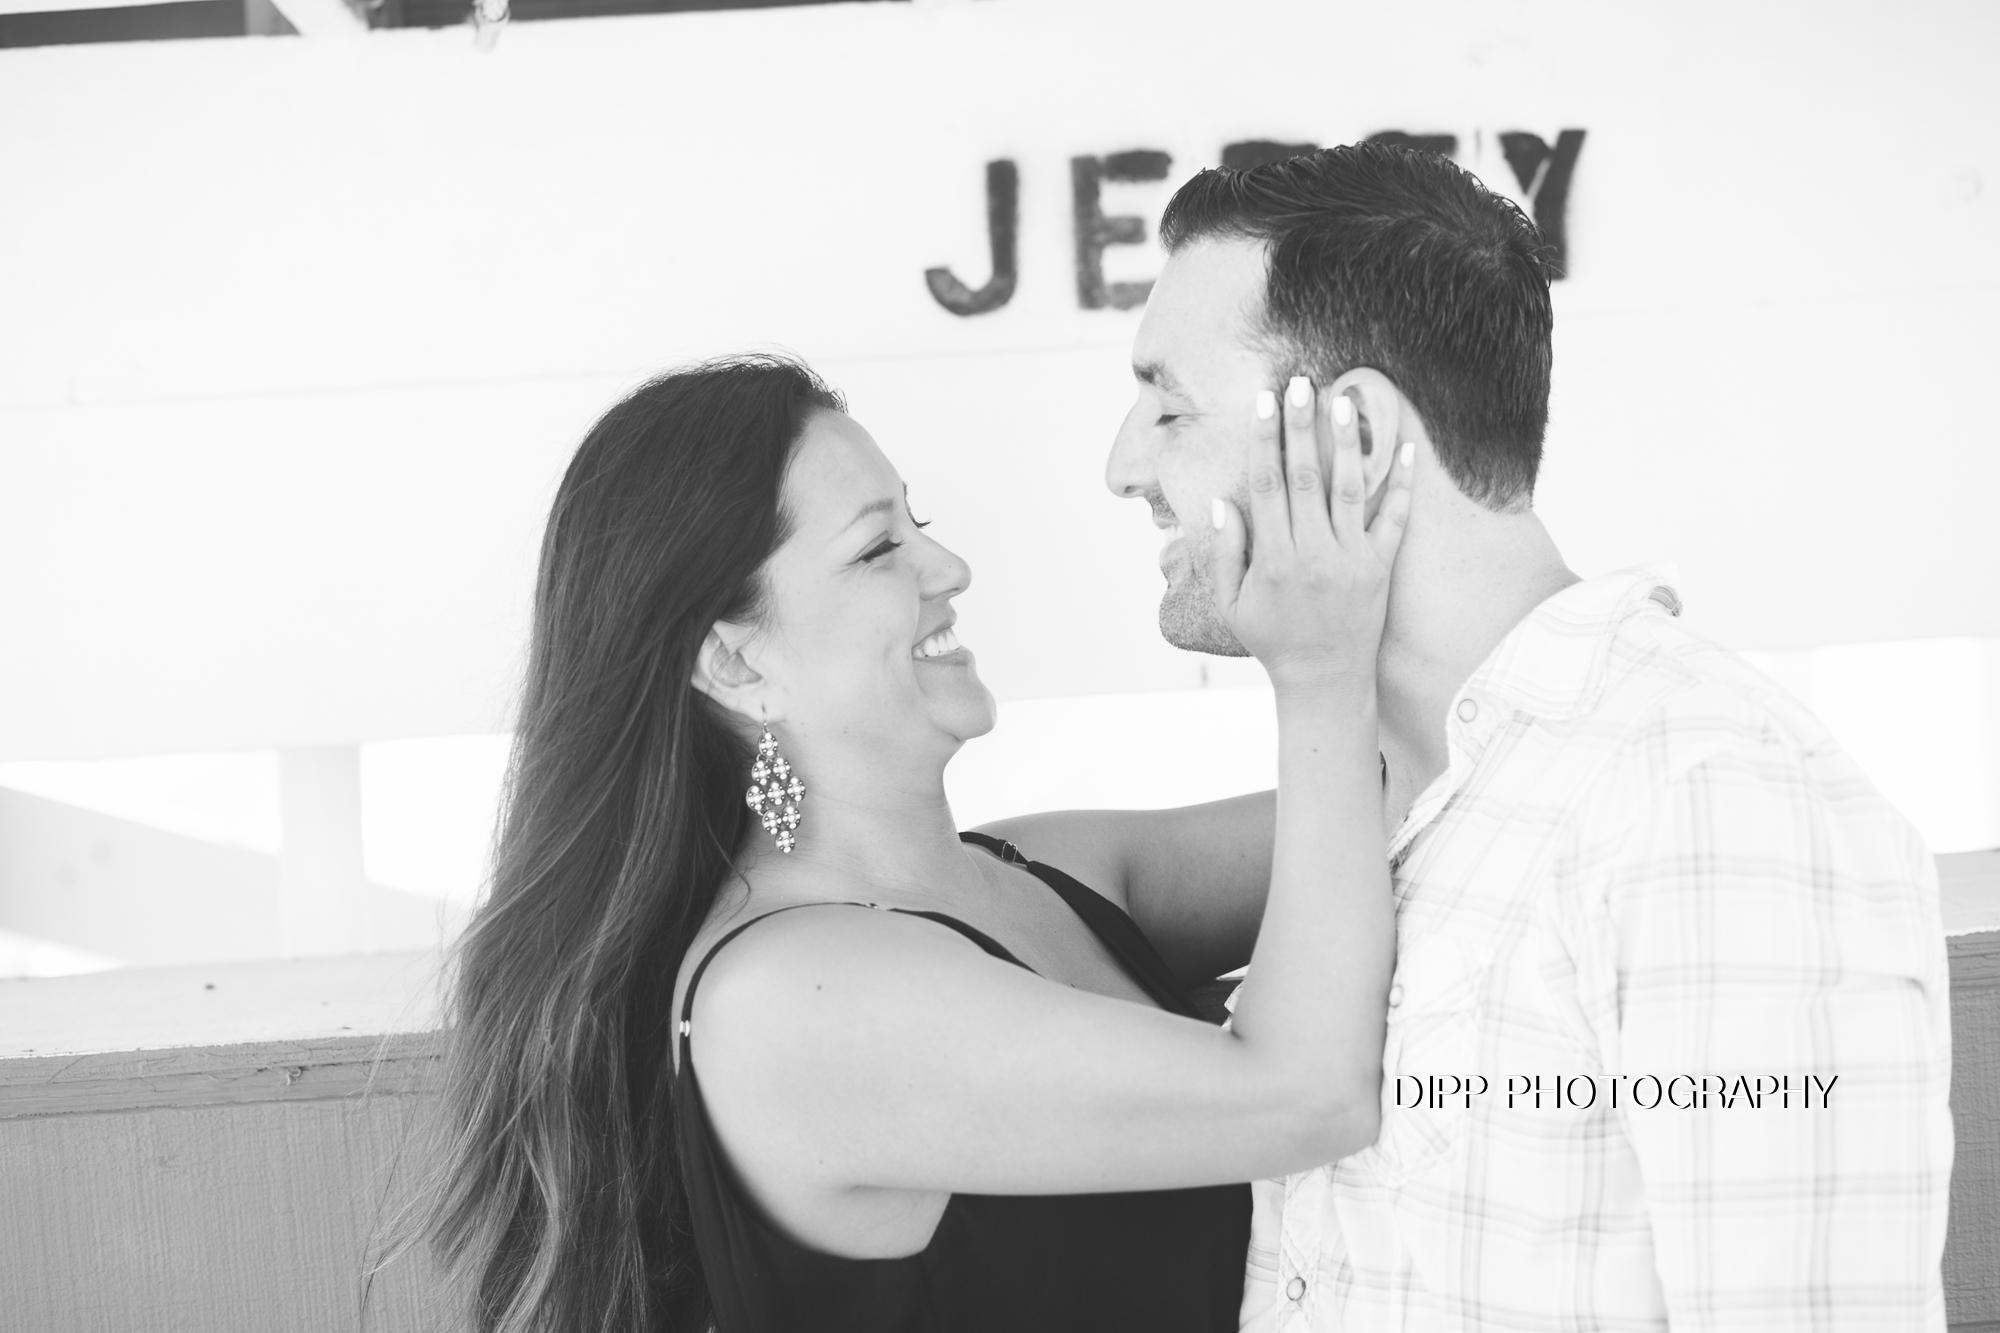 Dipp_2016 Brandon & Sara Mini Engagement Session-115-Edit